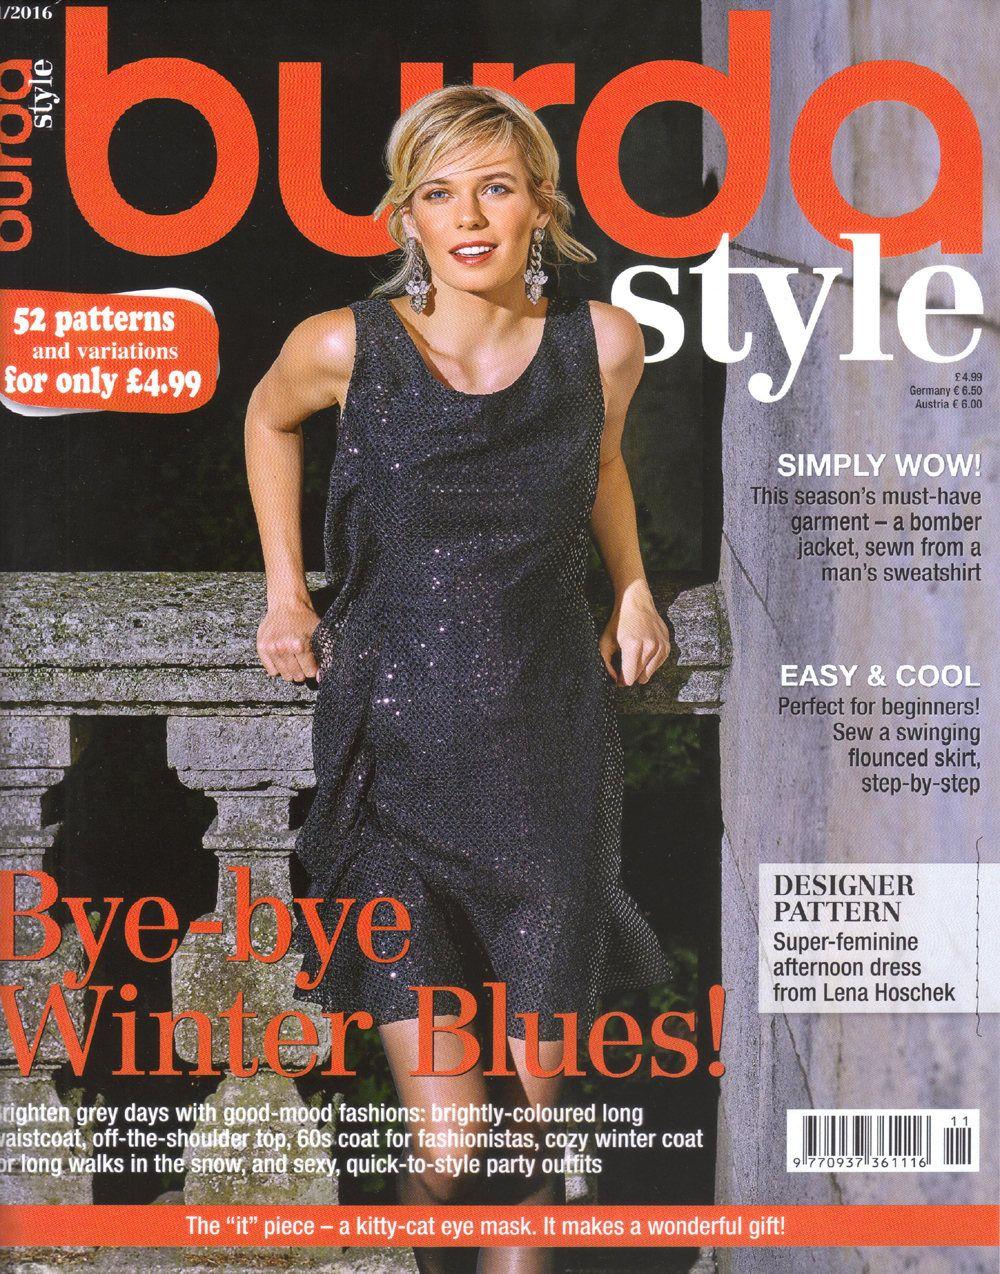 Burda style magazine 112016 english sewing patterns by burda style magazine 112016 english sewing patterns by honeyjamsuniques on etsy jeuxipadfo Image collections